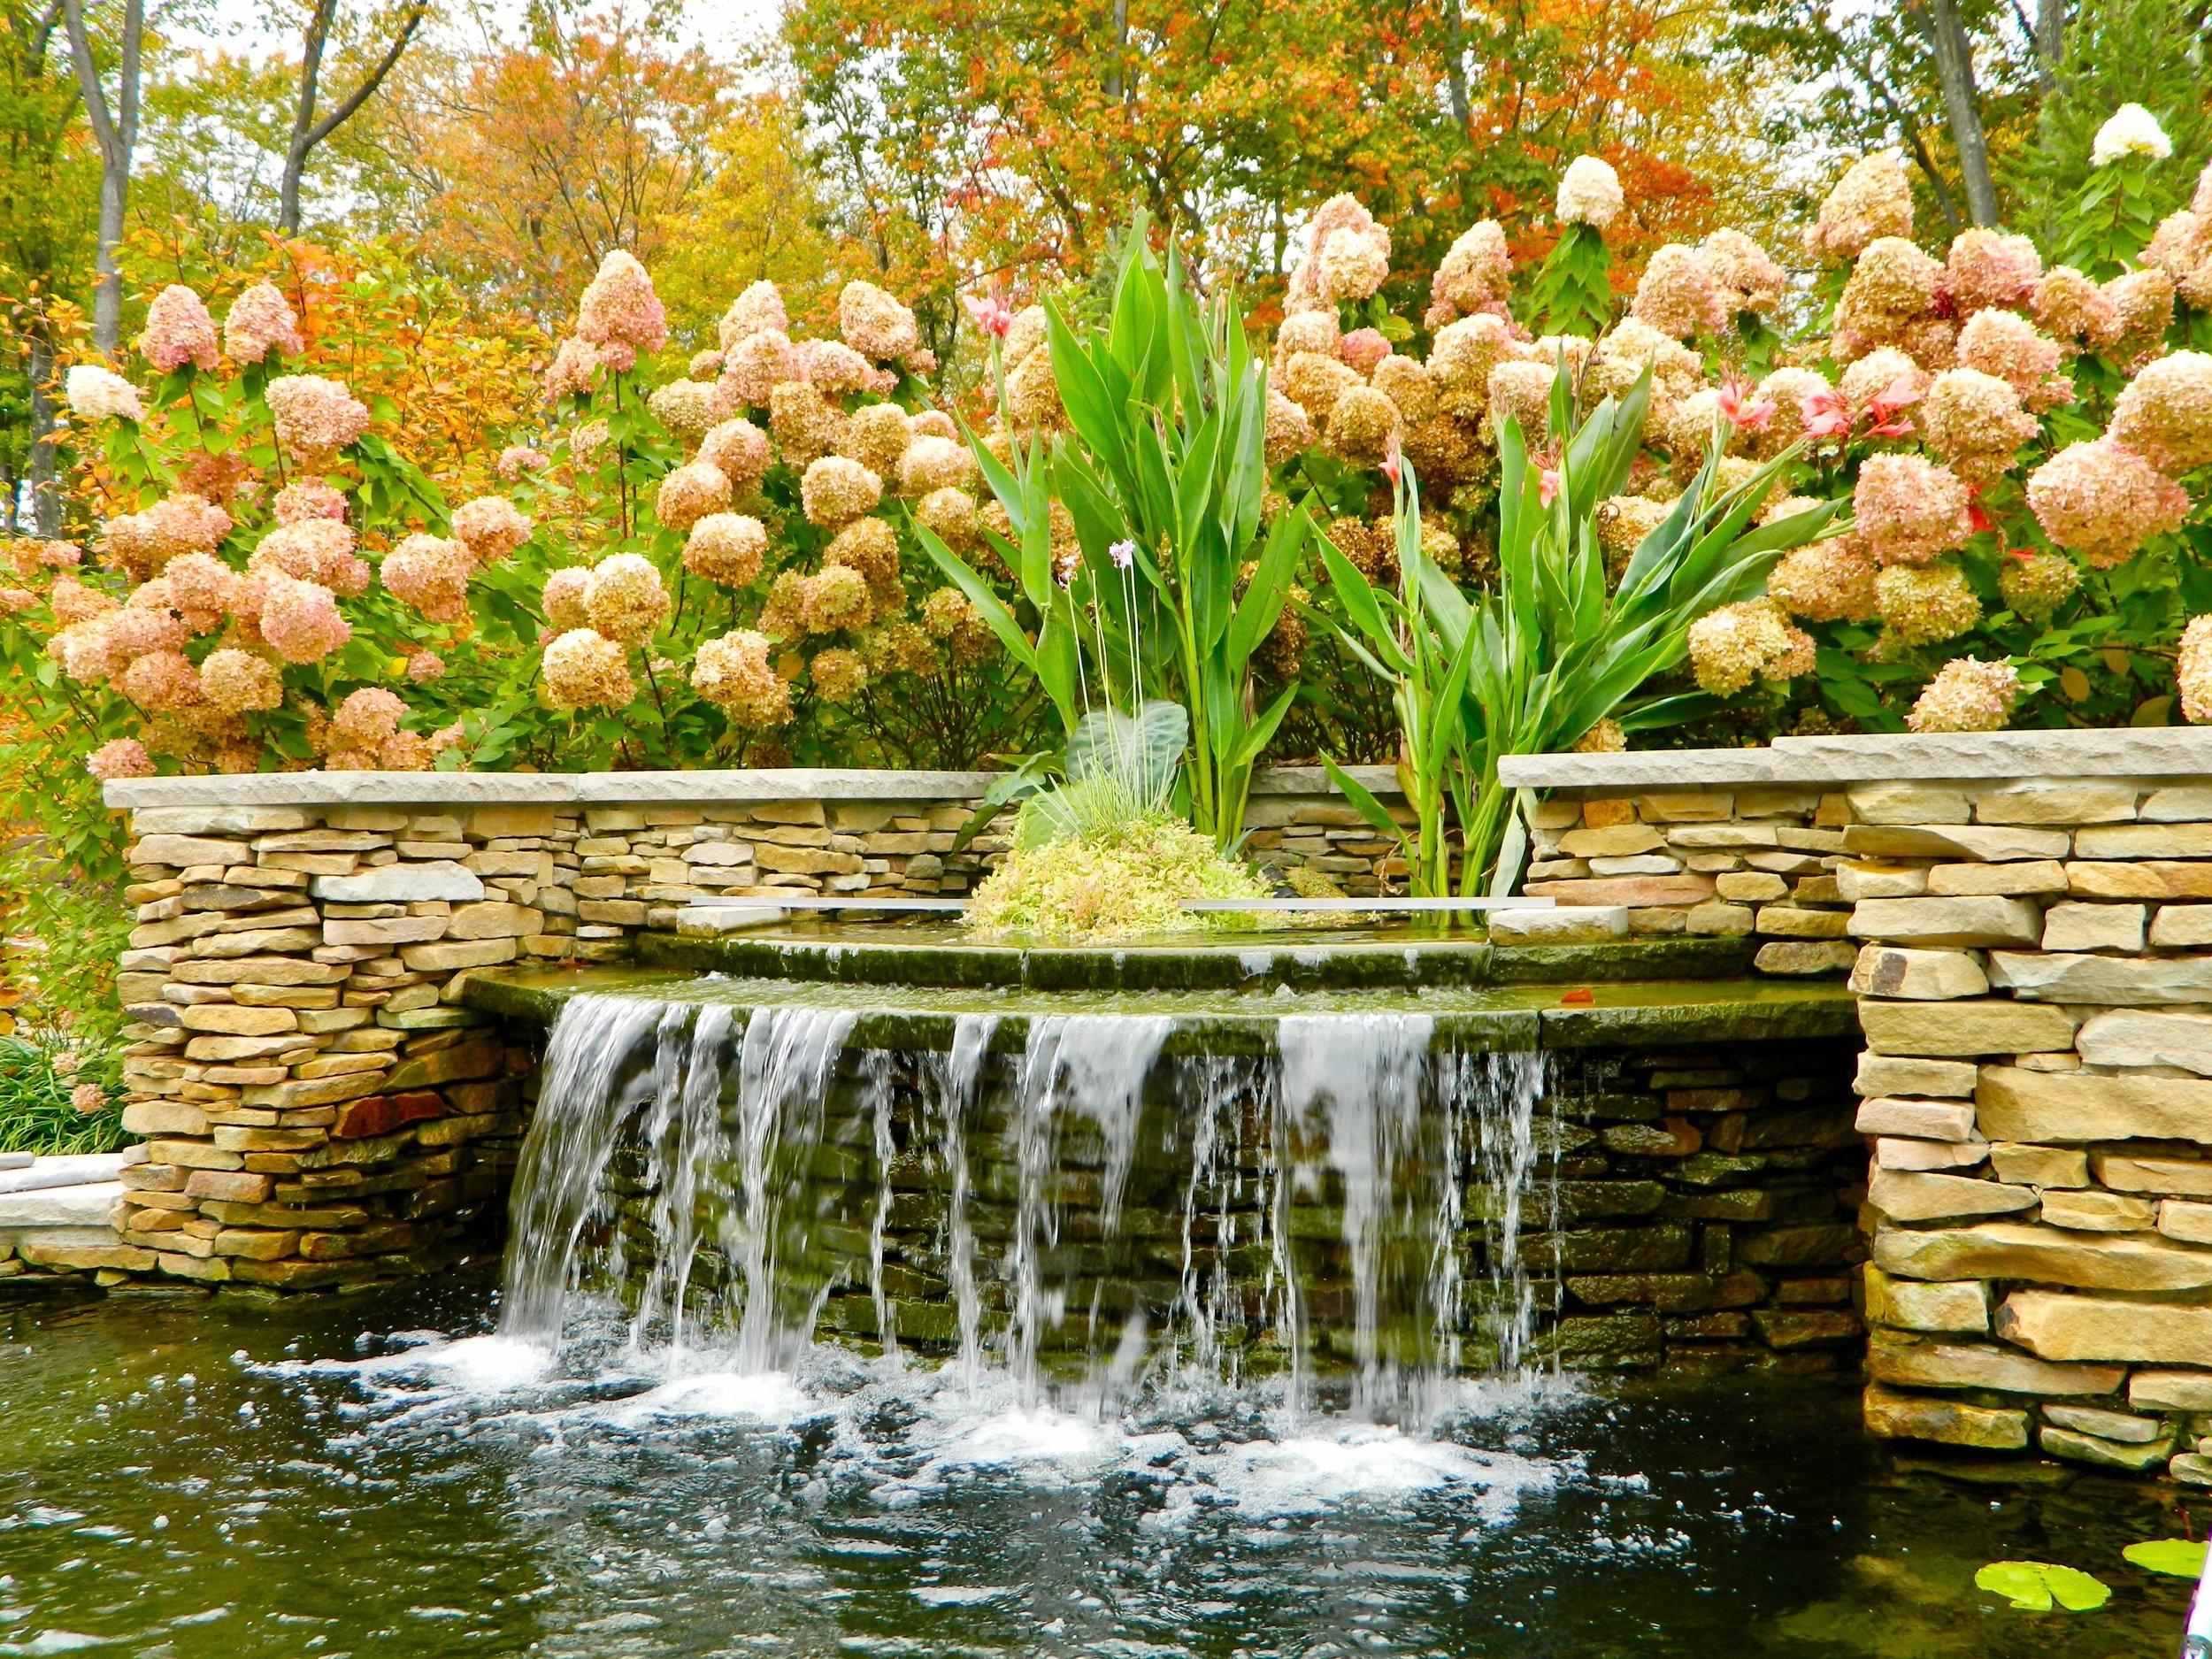 The Blackwood Group Landscape Design Project in Heights of North Park, PAThe Blackwood Group Landscape Design Project in Heights of North Park, PA